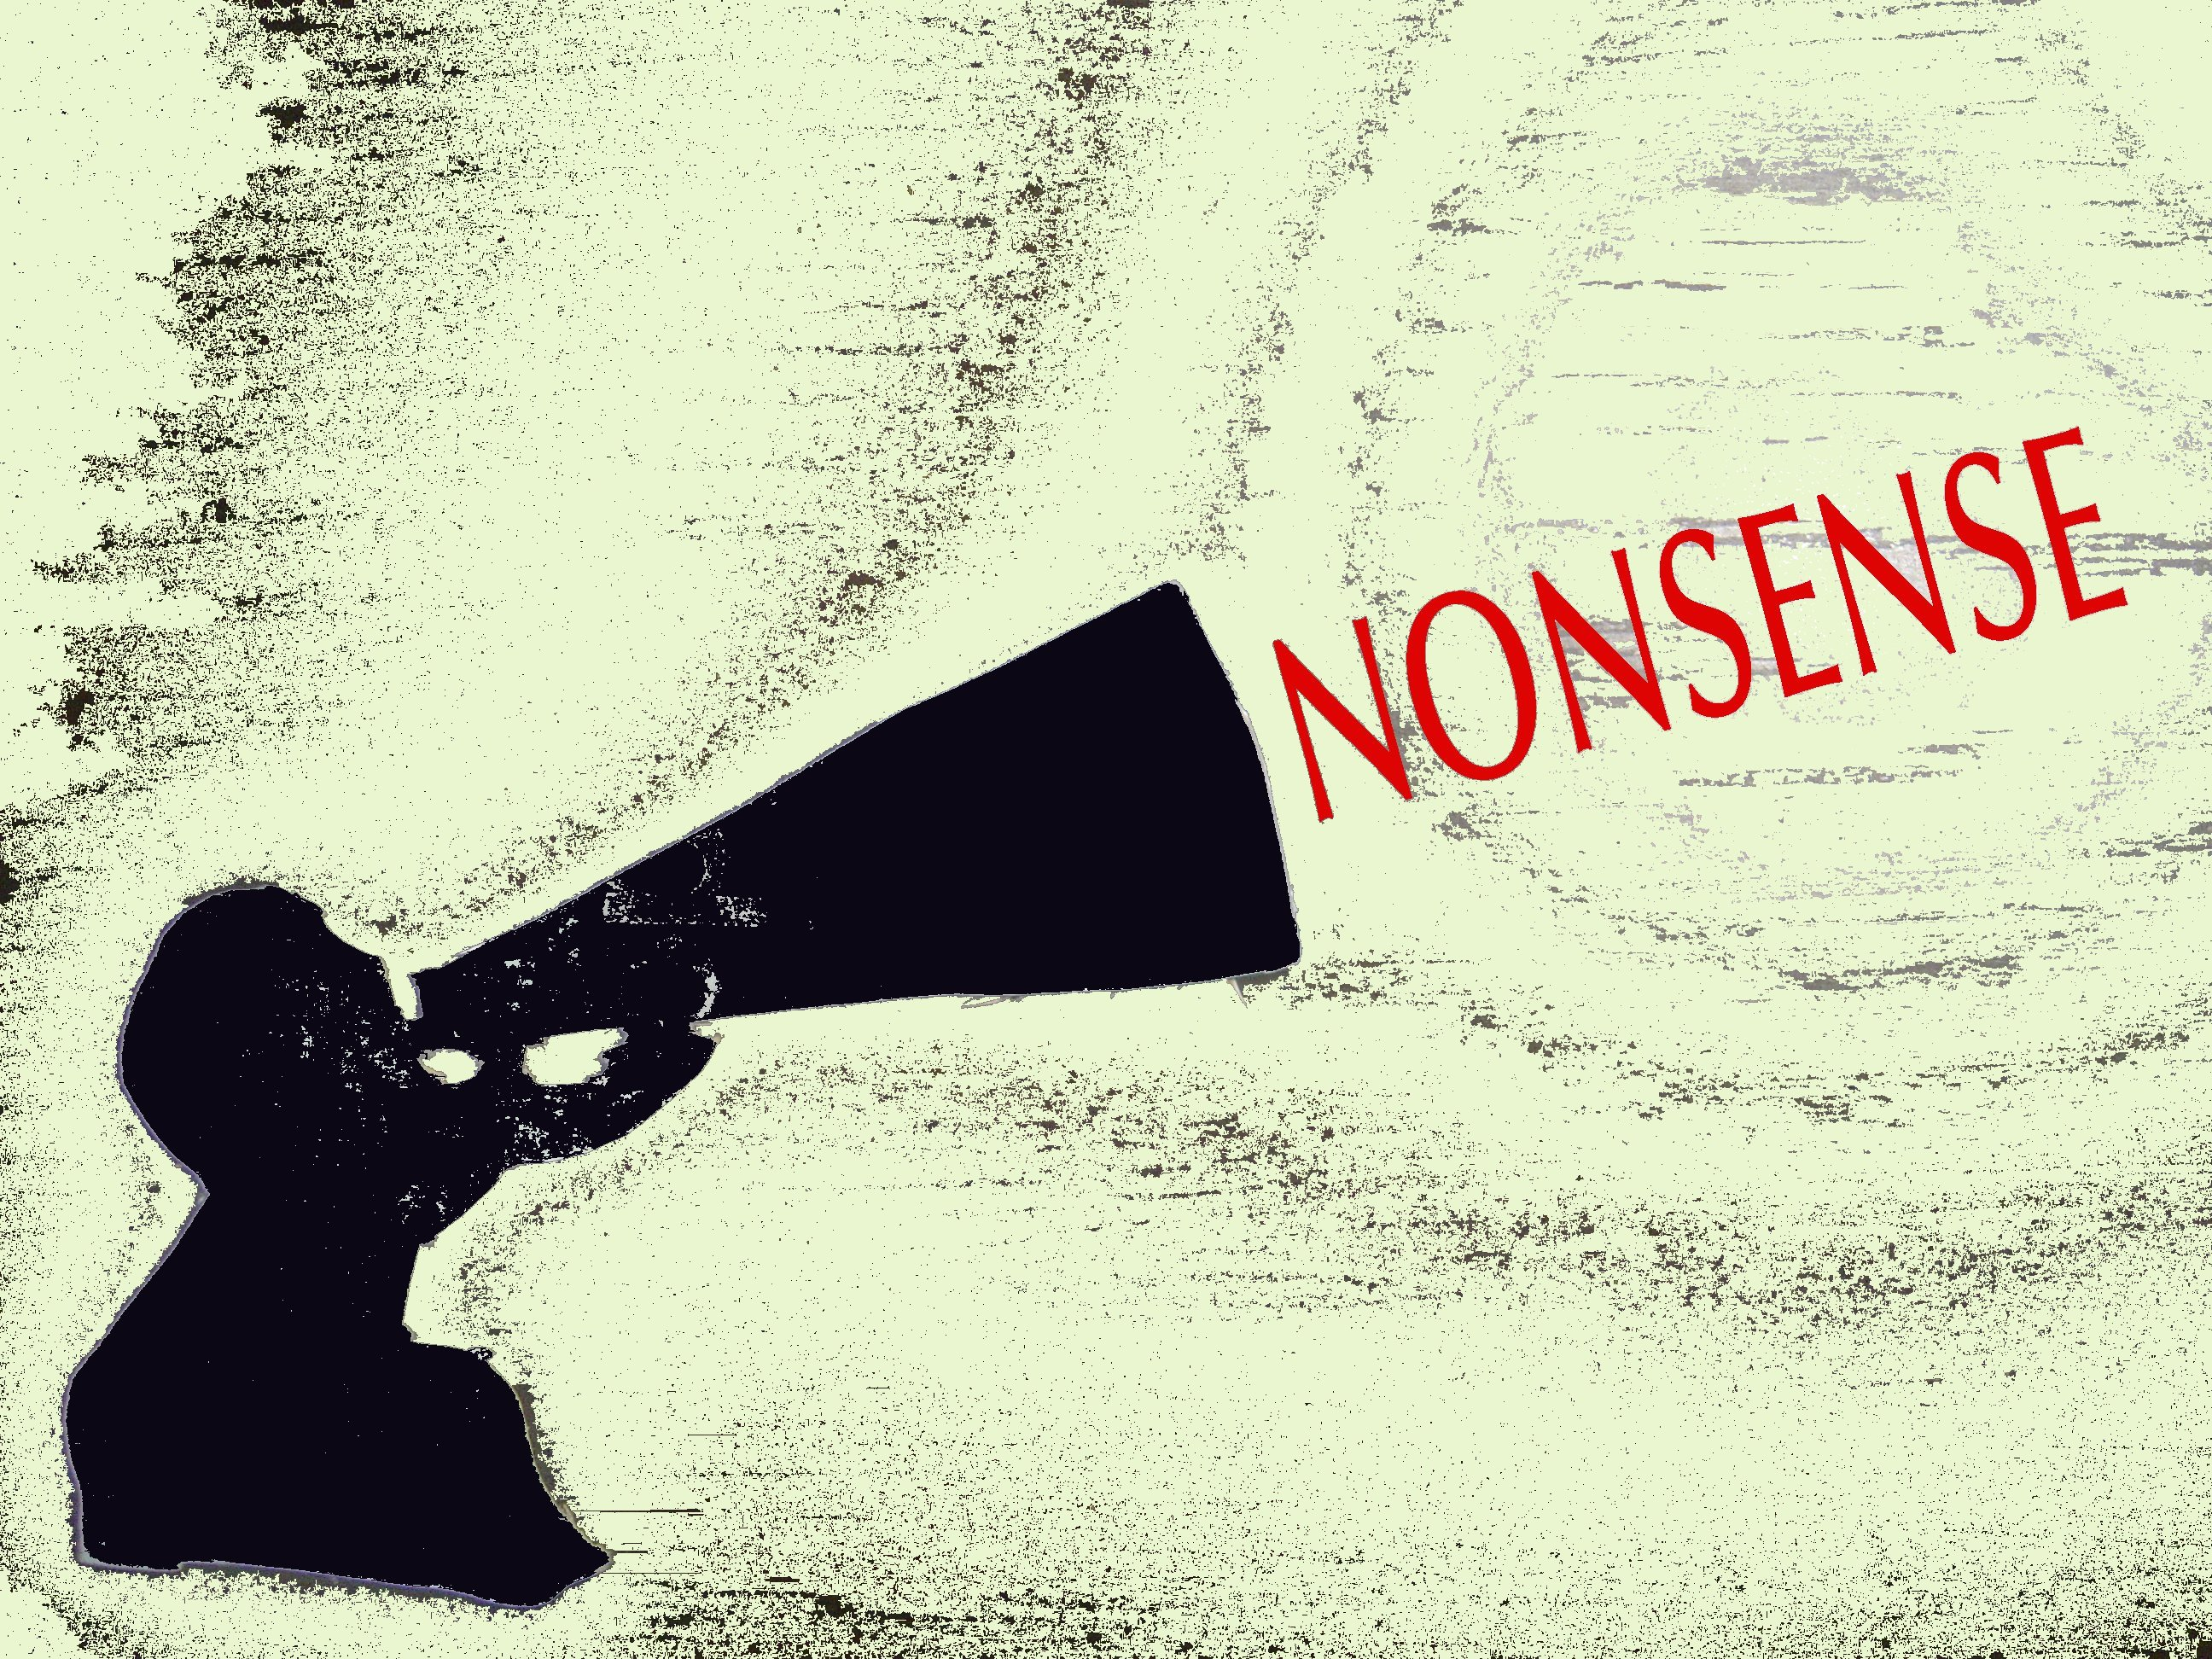 nonsense-logo-messy-2014.jpg